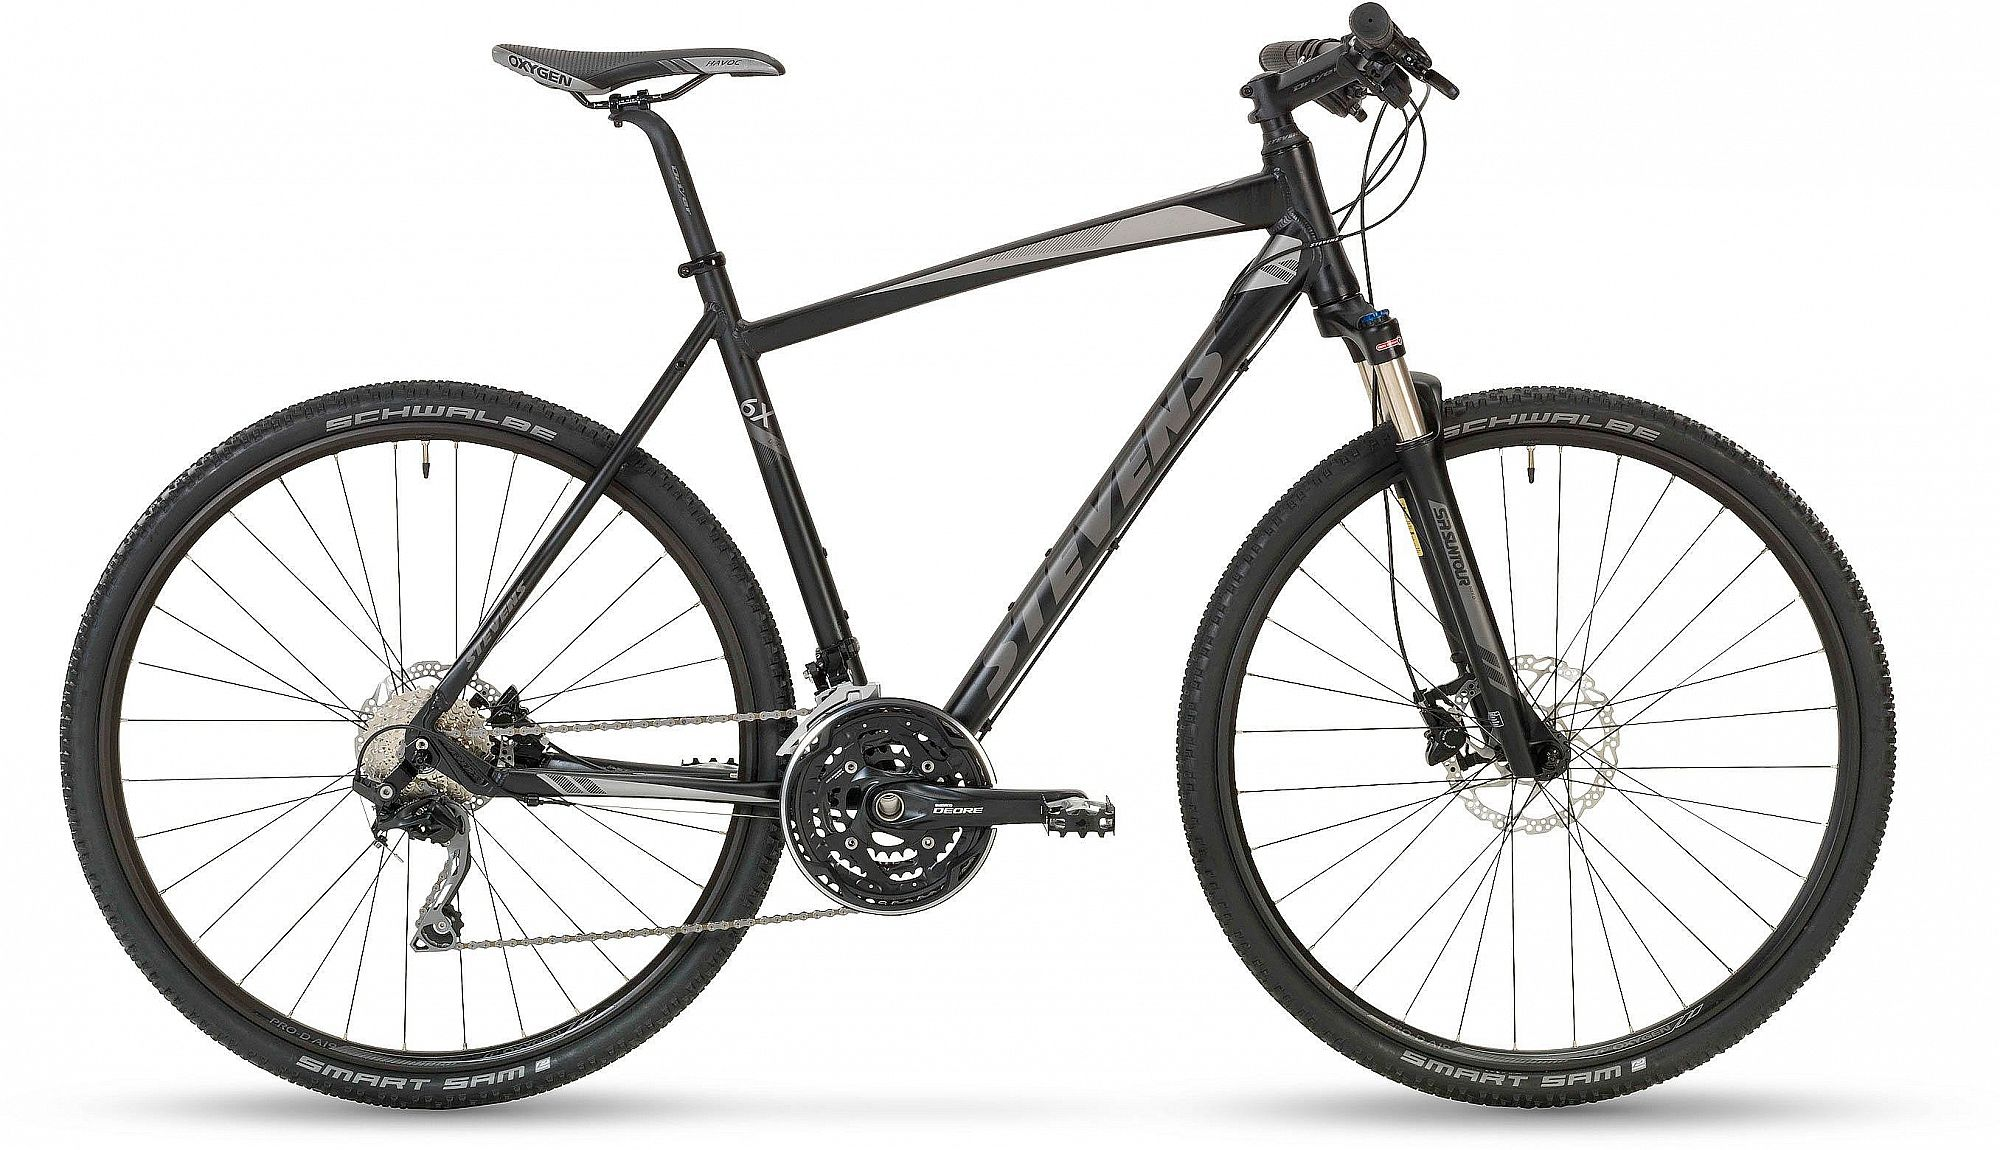 stevens 2017 6x disc 28 ern x series stevens bikes. Black Bedroom Furniture Sets. Home Design Ideas